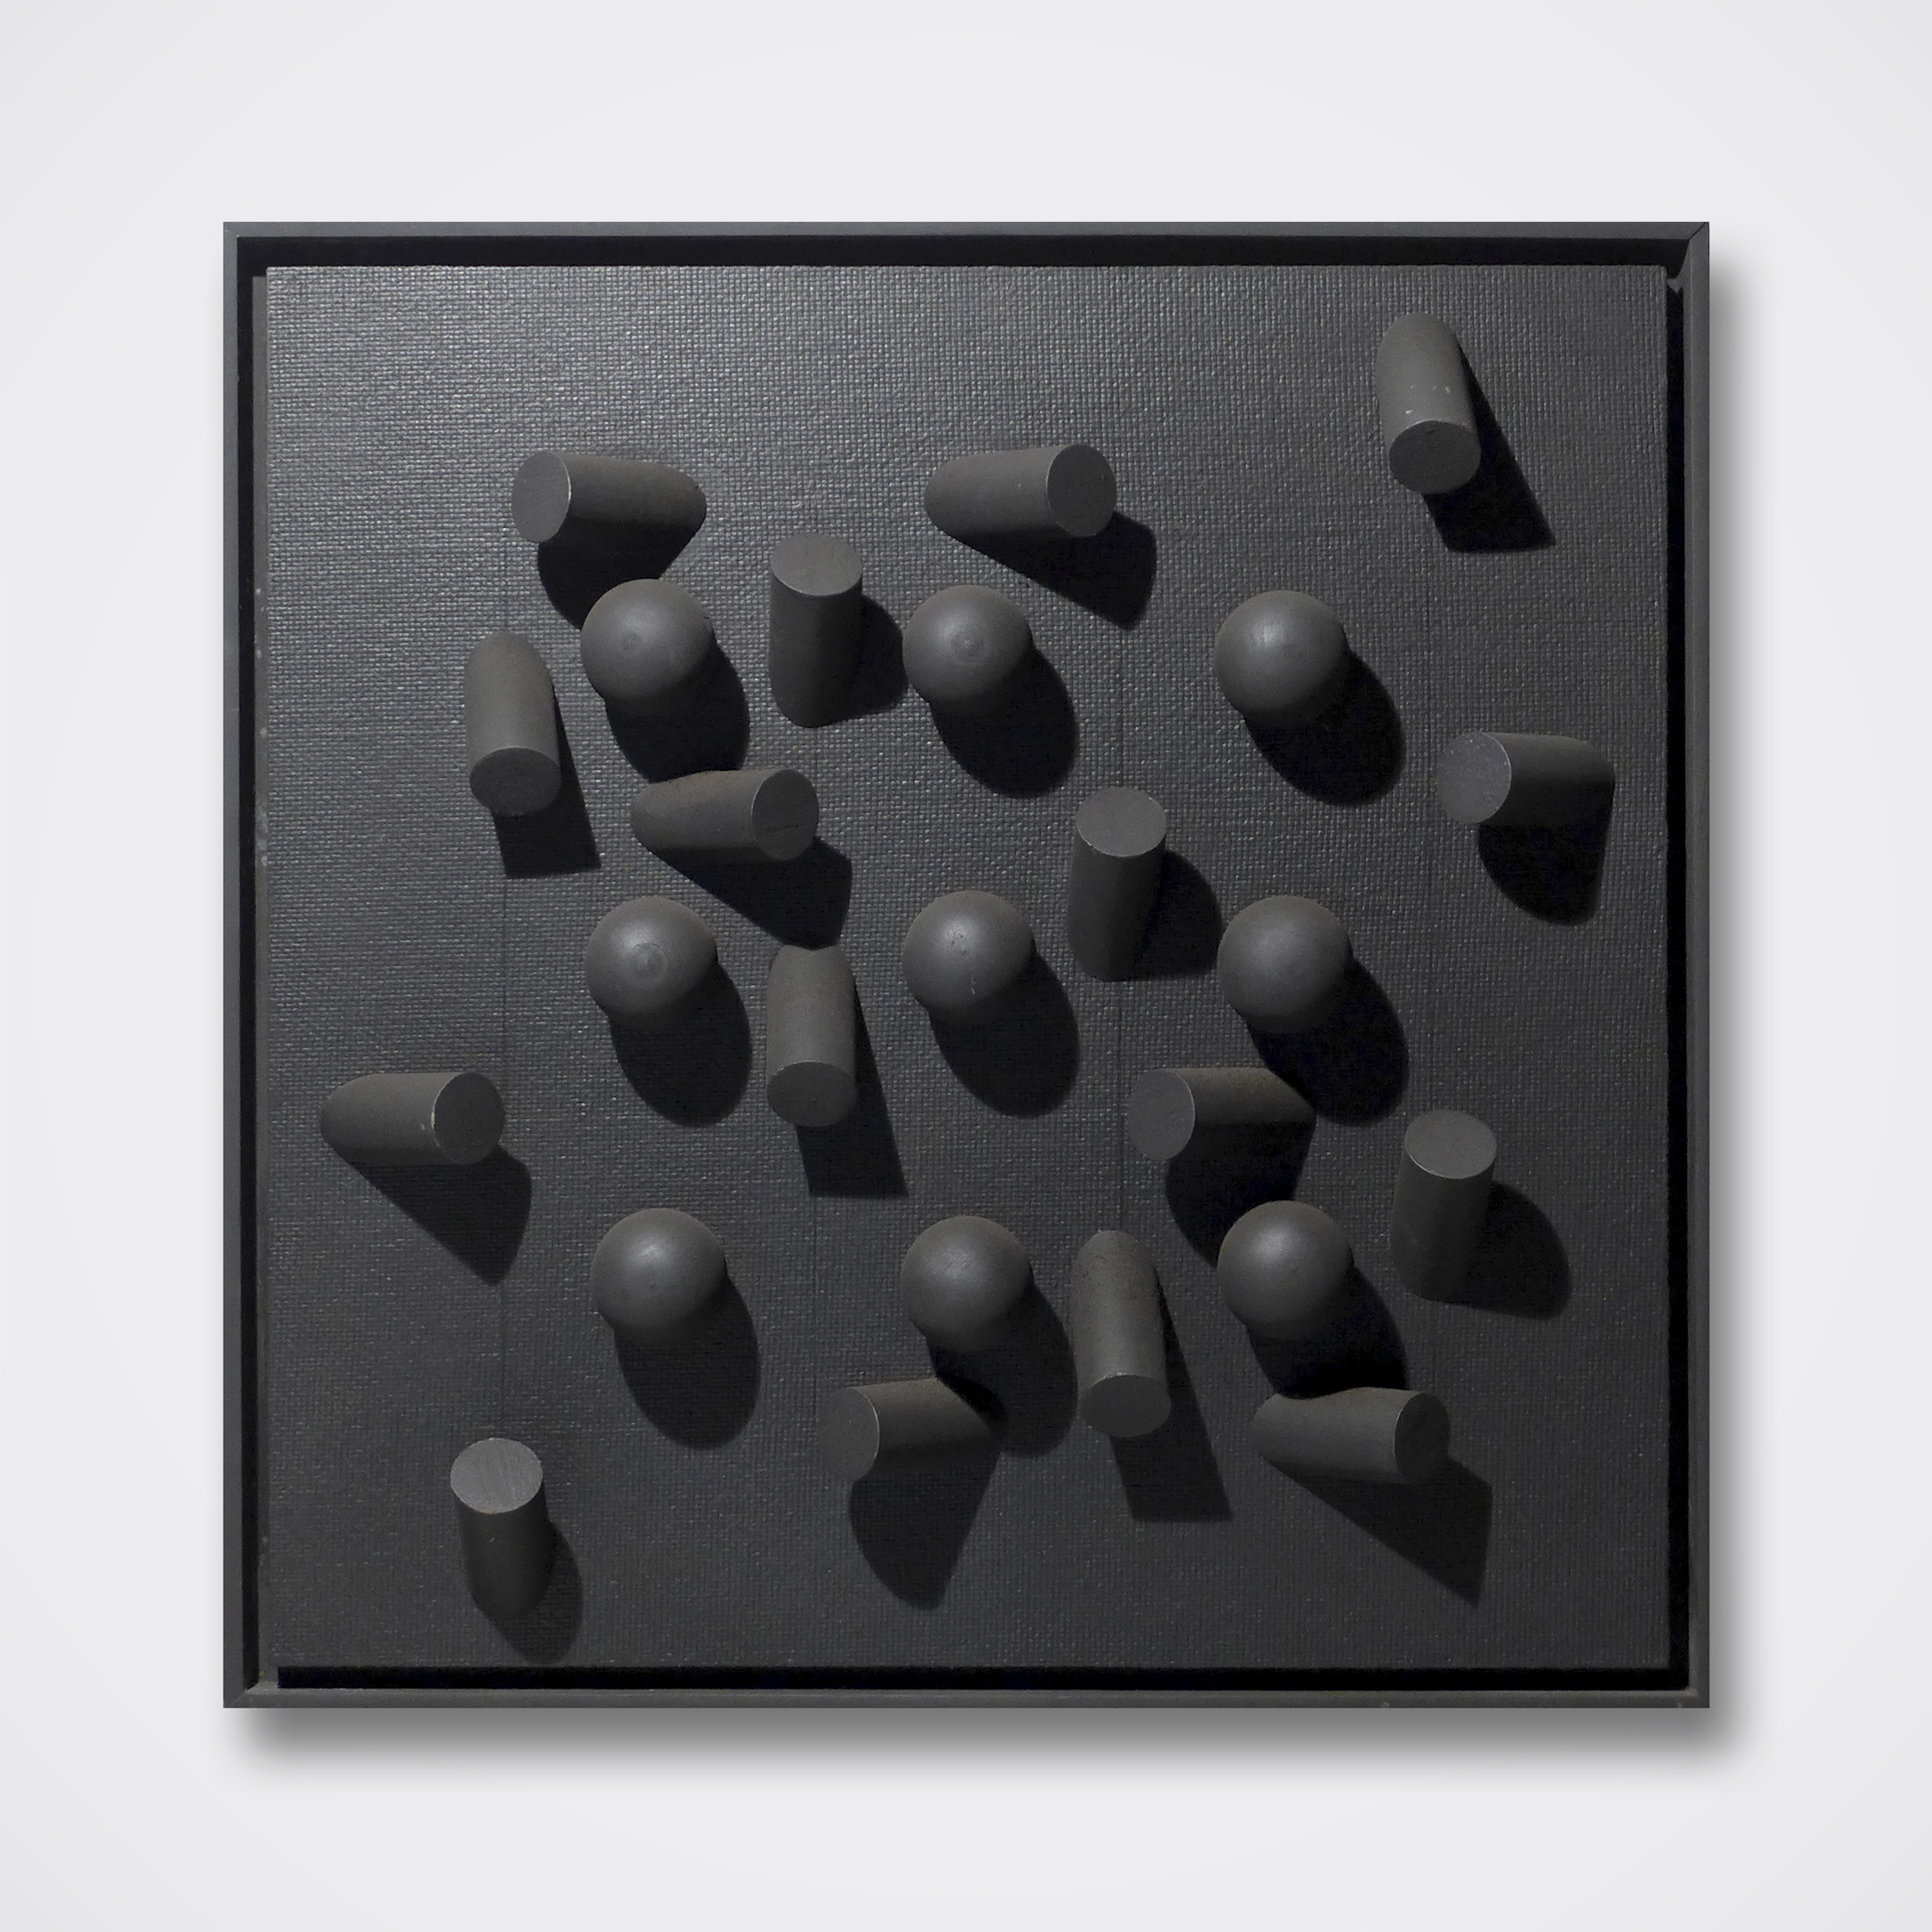 James McNair, Untitled (black), 1962, wood construction 16x16